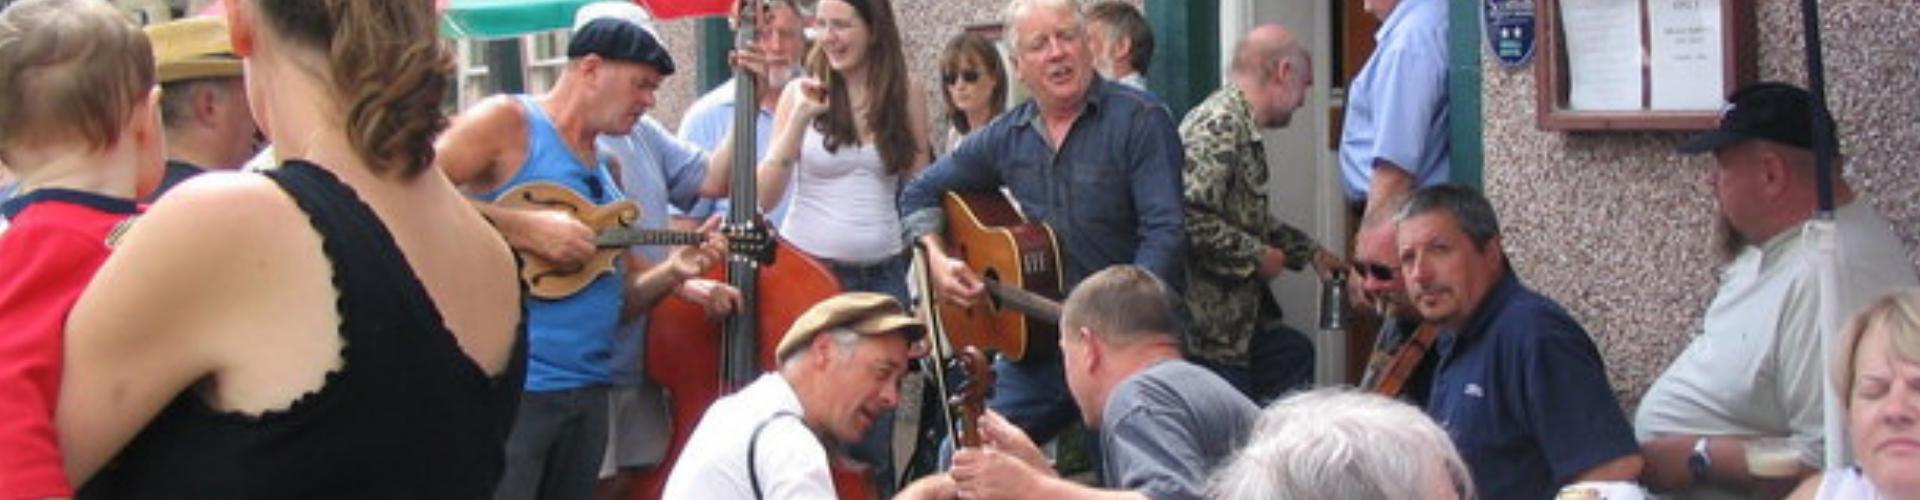 Newcastleton Riverview music festival